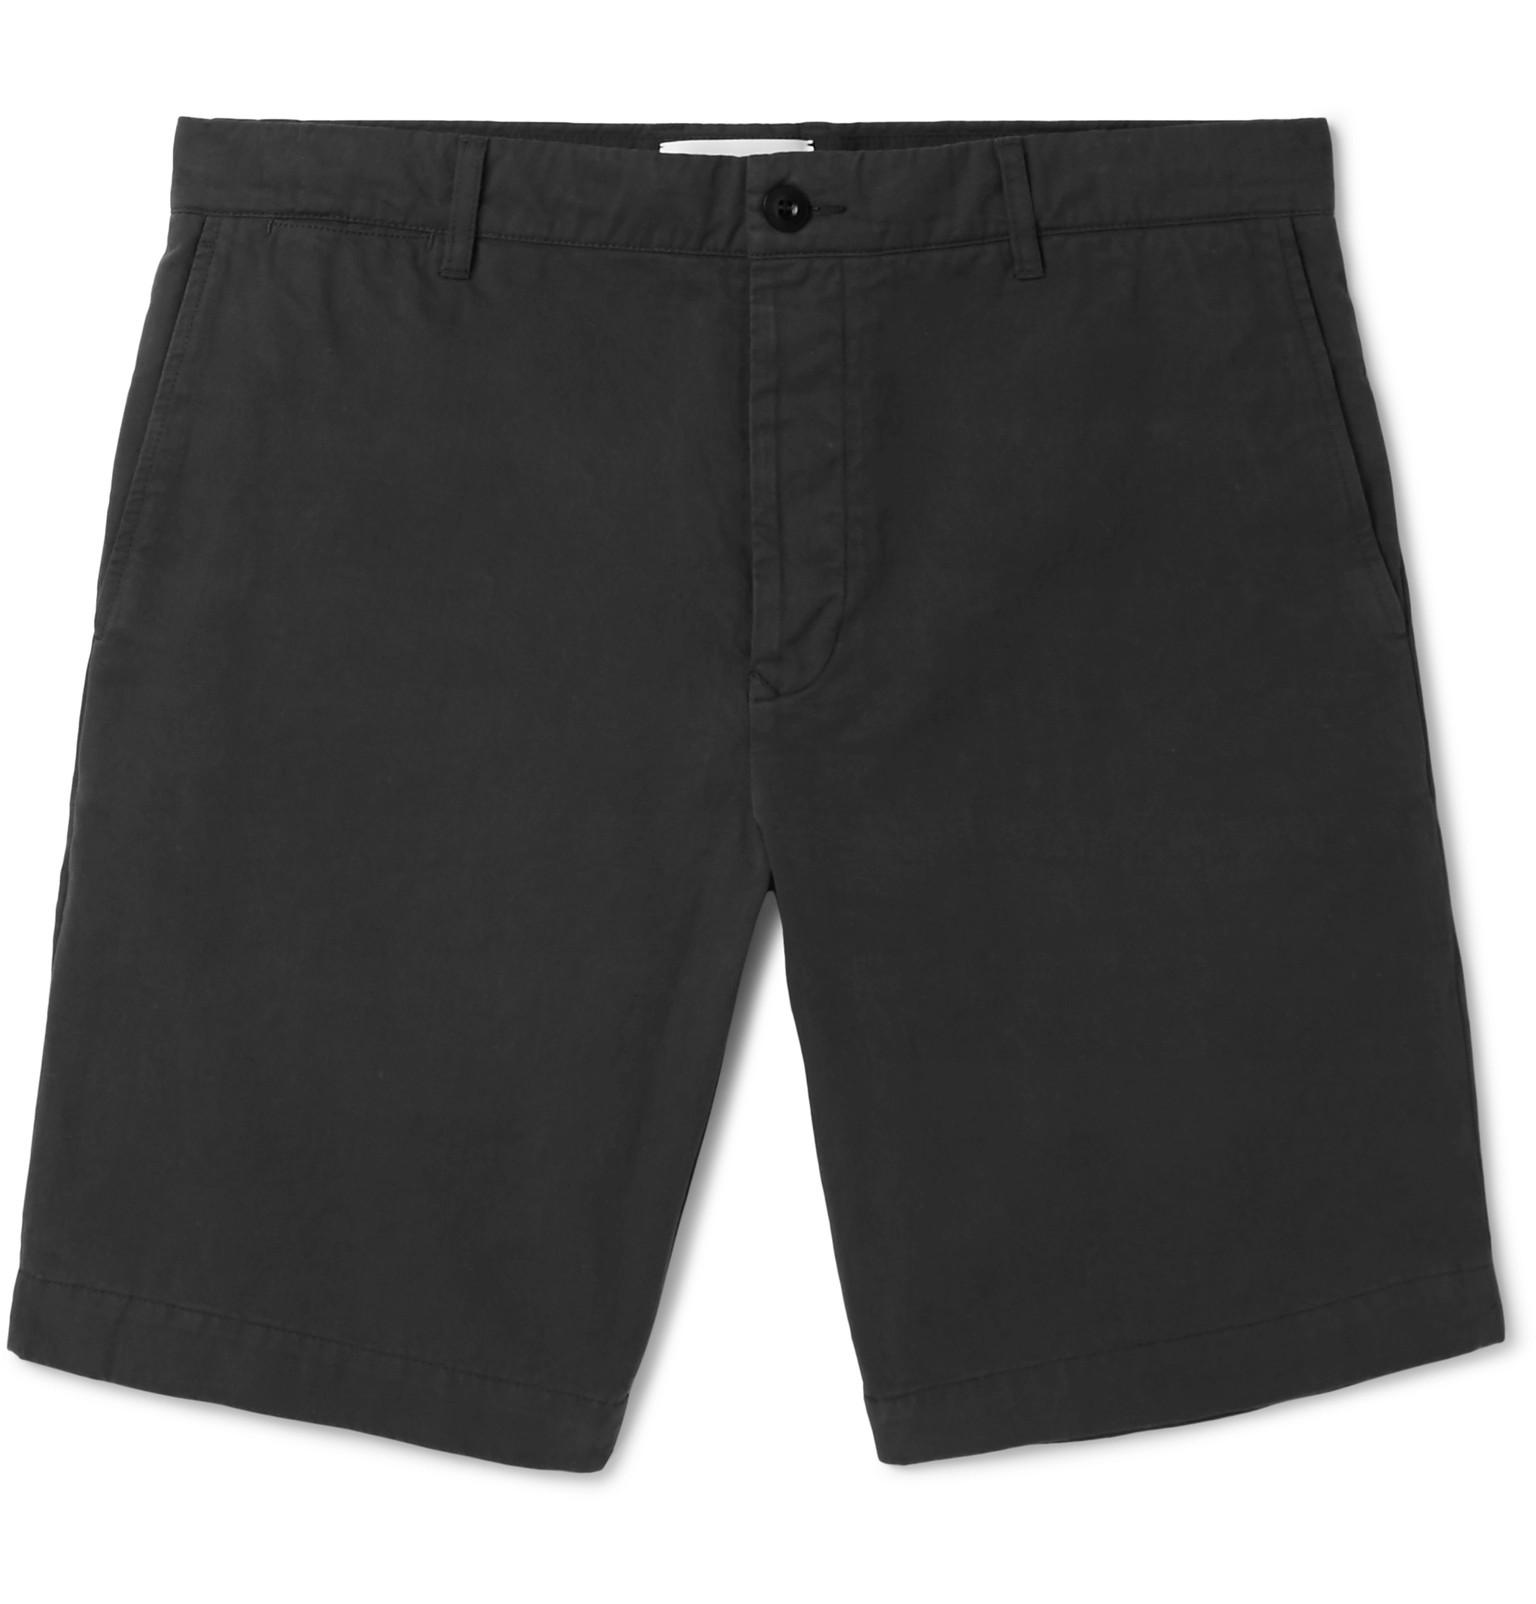 Mr P. Garment-dyed Cotton-twill Bermuda Shorts - Black fJ8VhNlnv